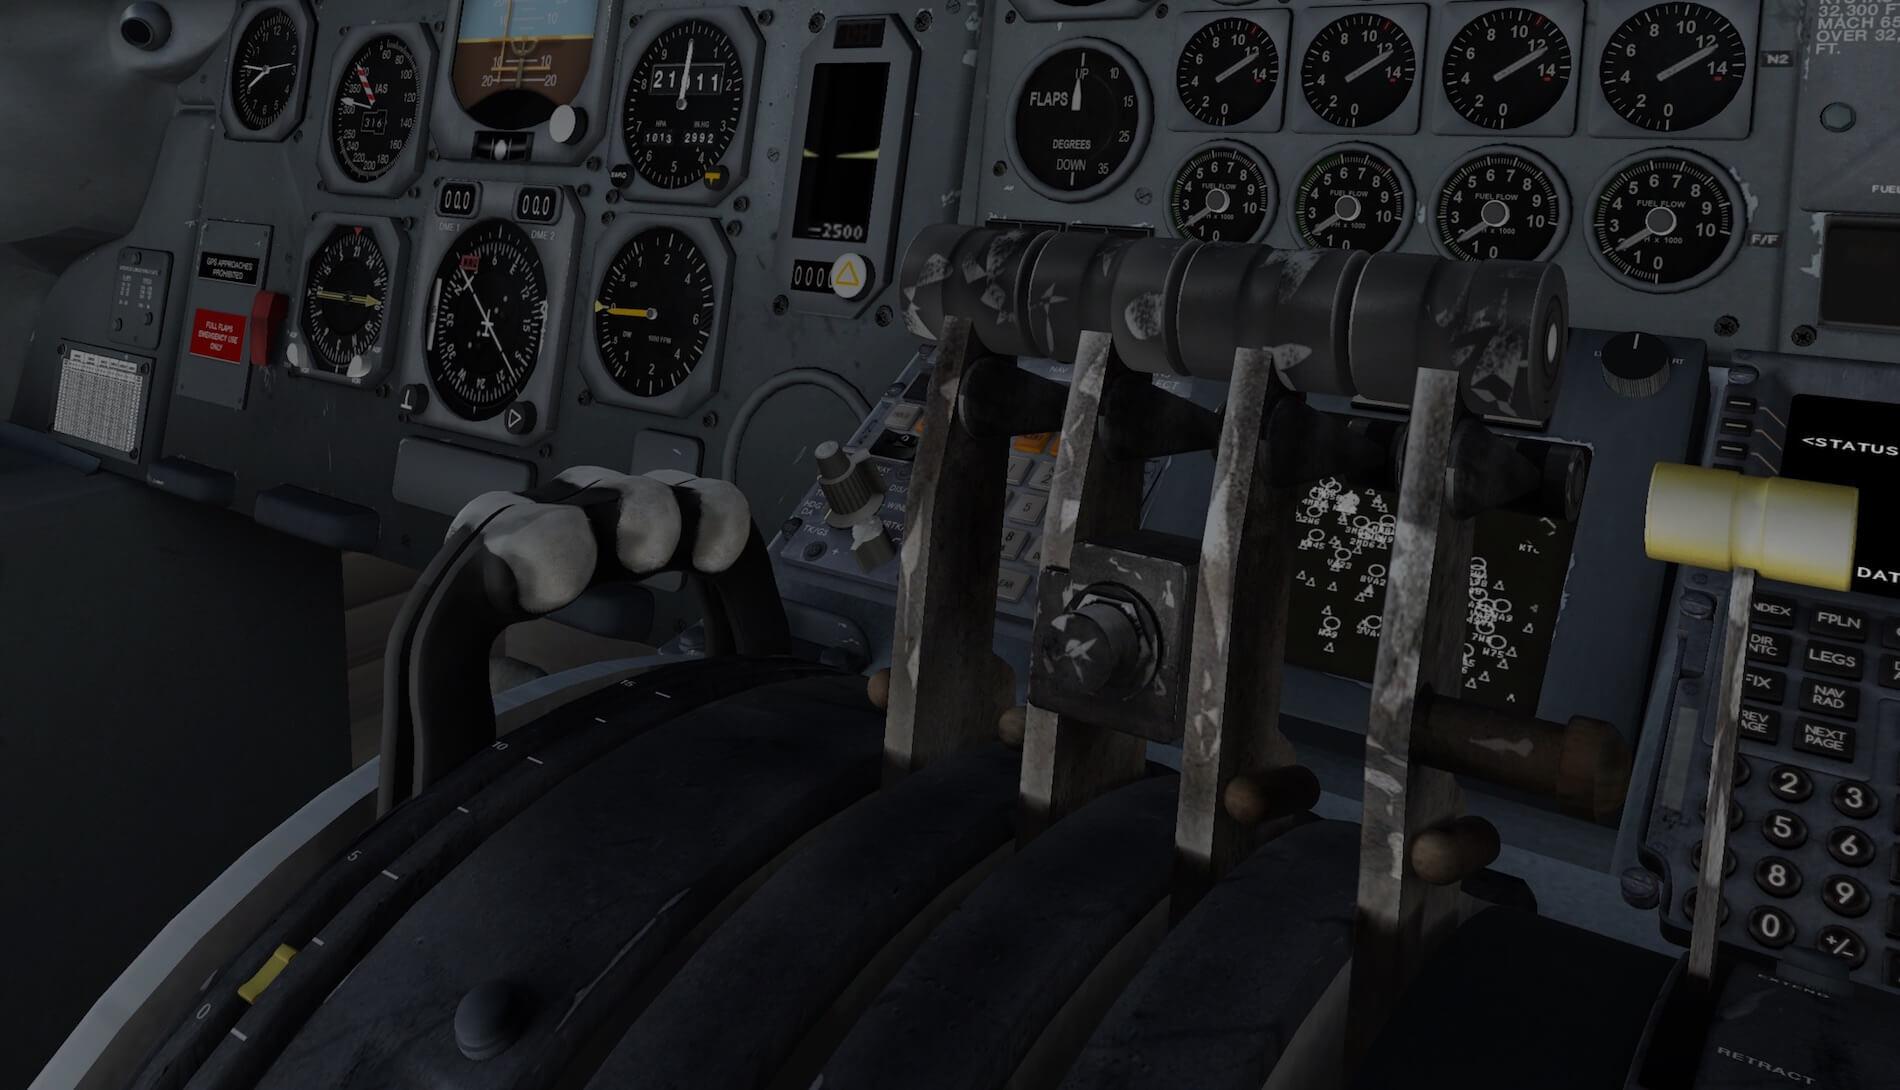 DC-8-61_17